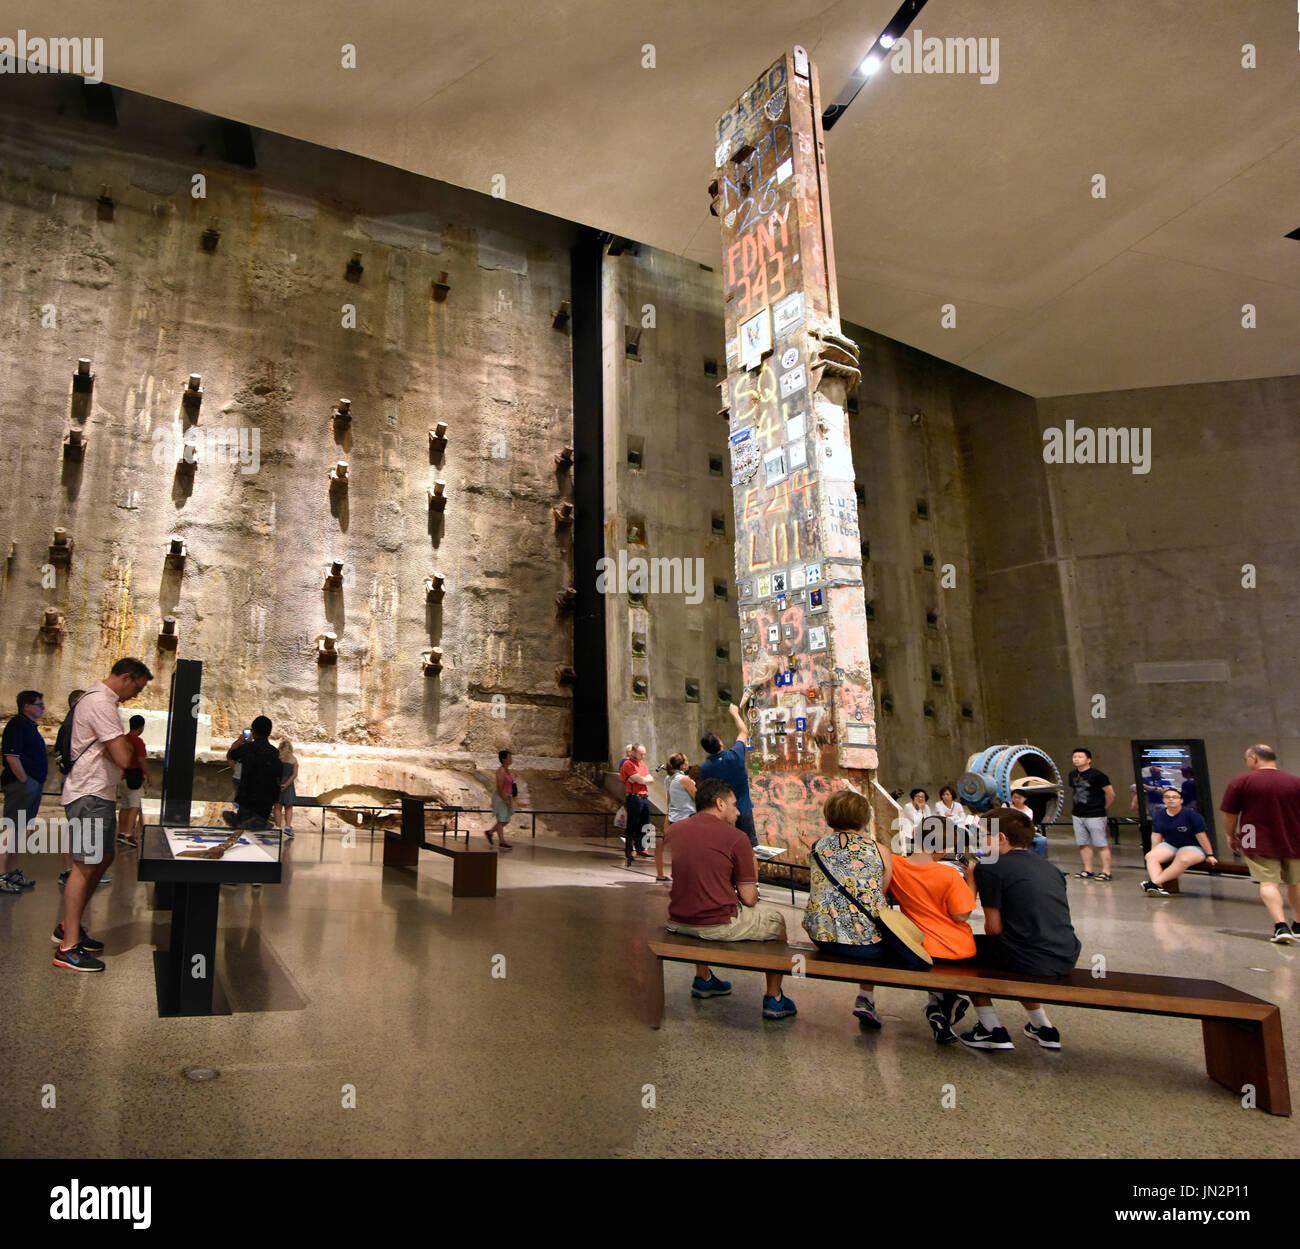 USA NY New York City Manhattan The National September 11 Memorial & Museum Stock Photo